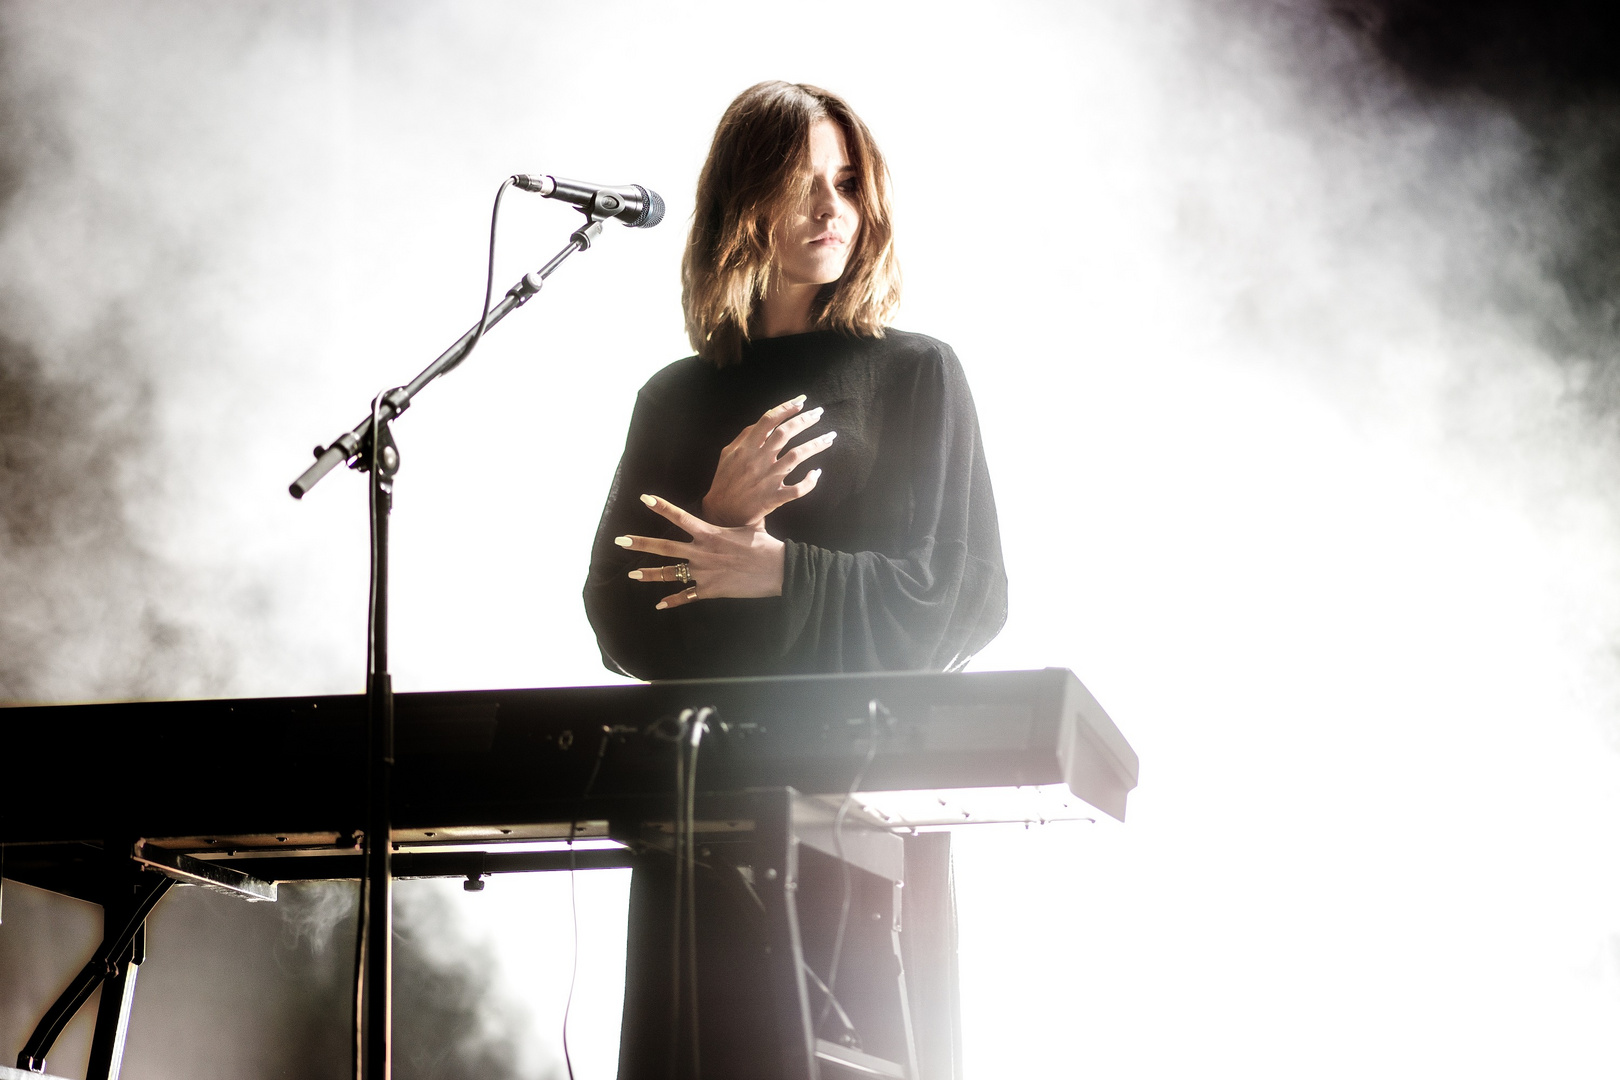 Dillon at Berlin Festival